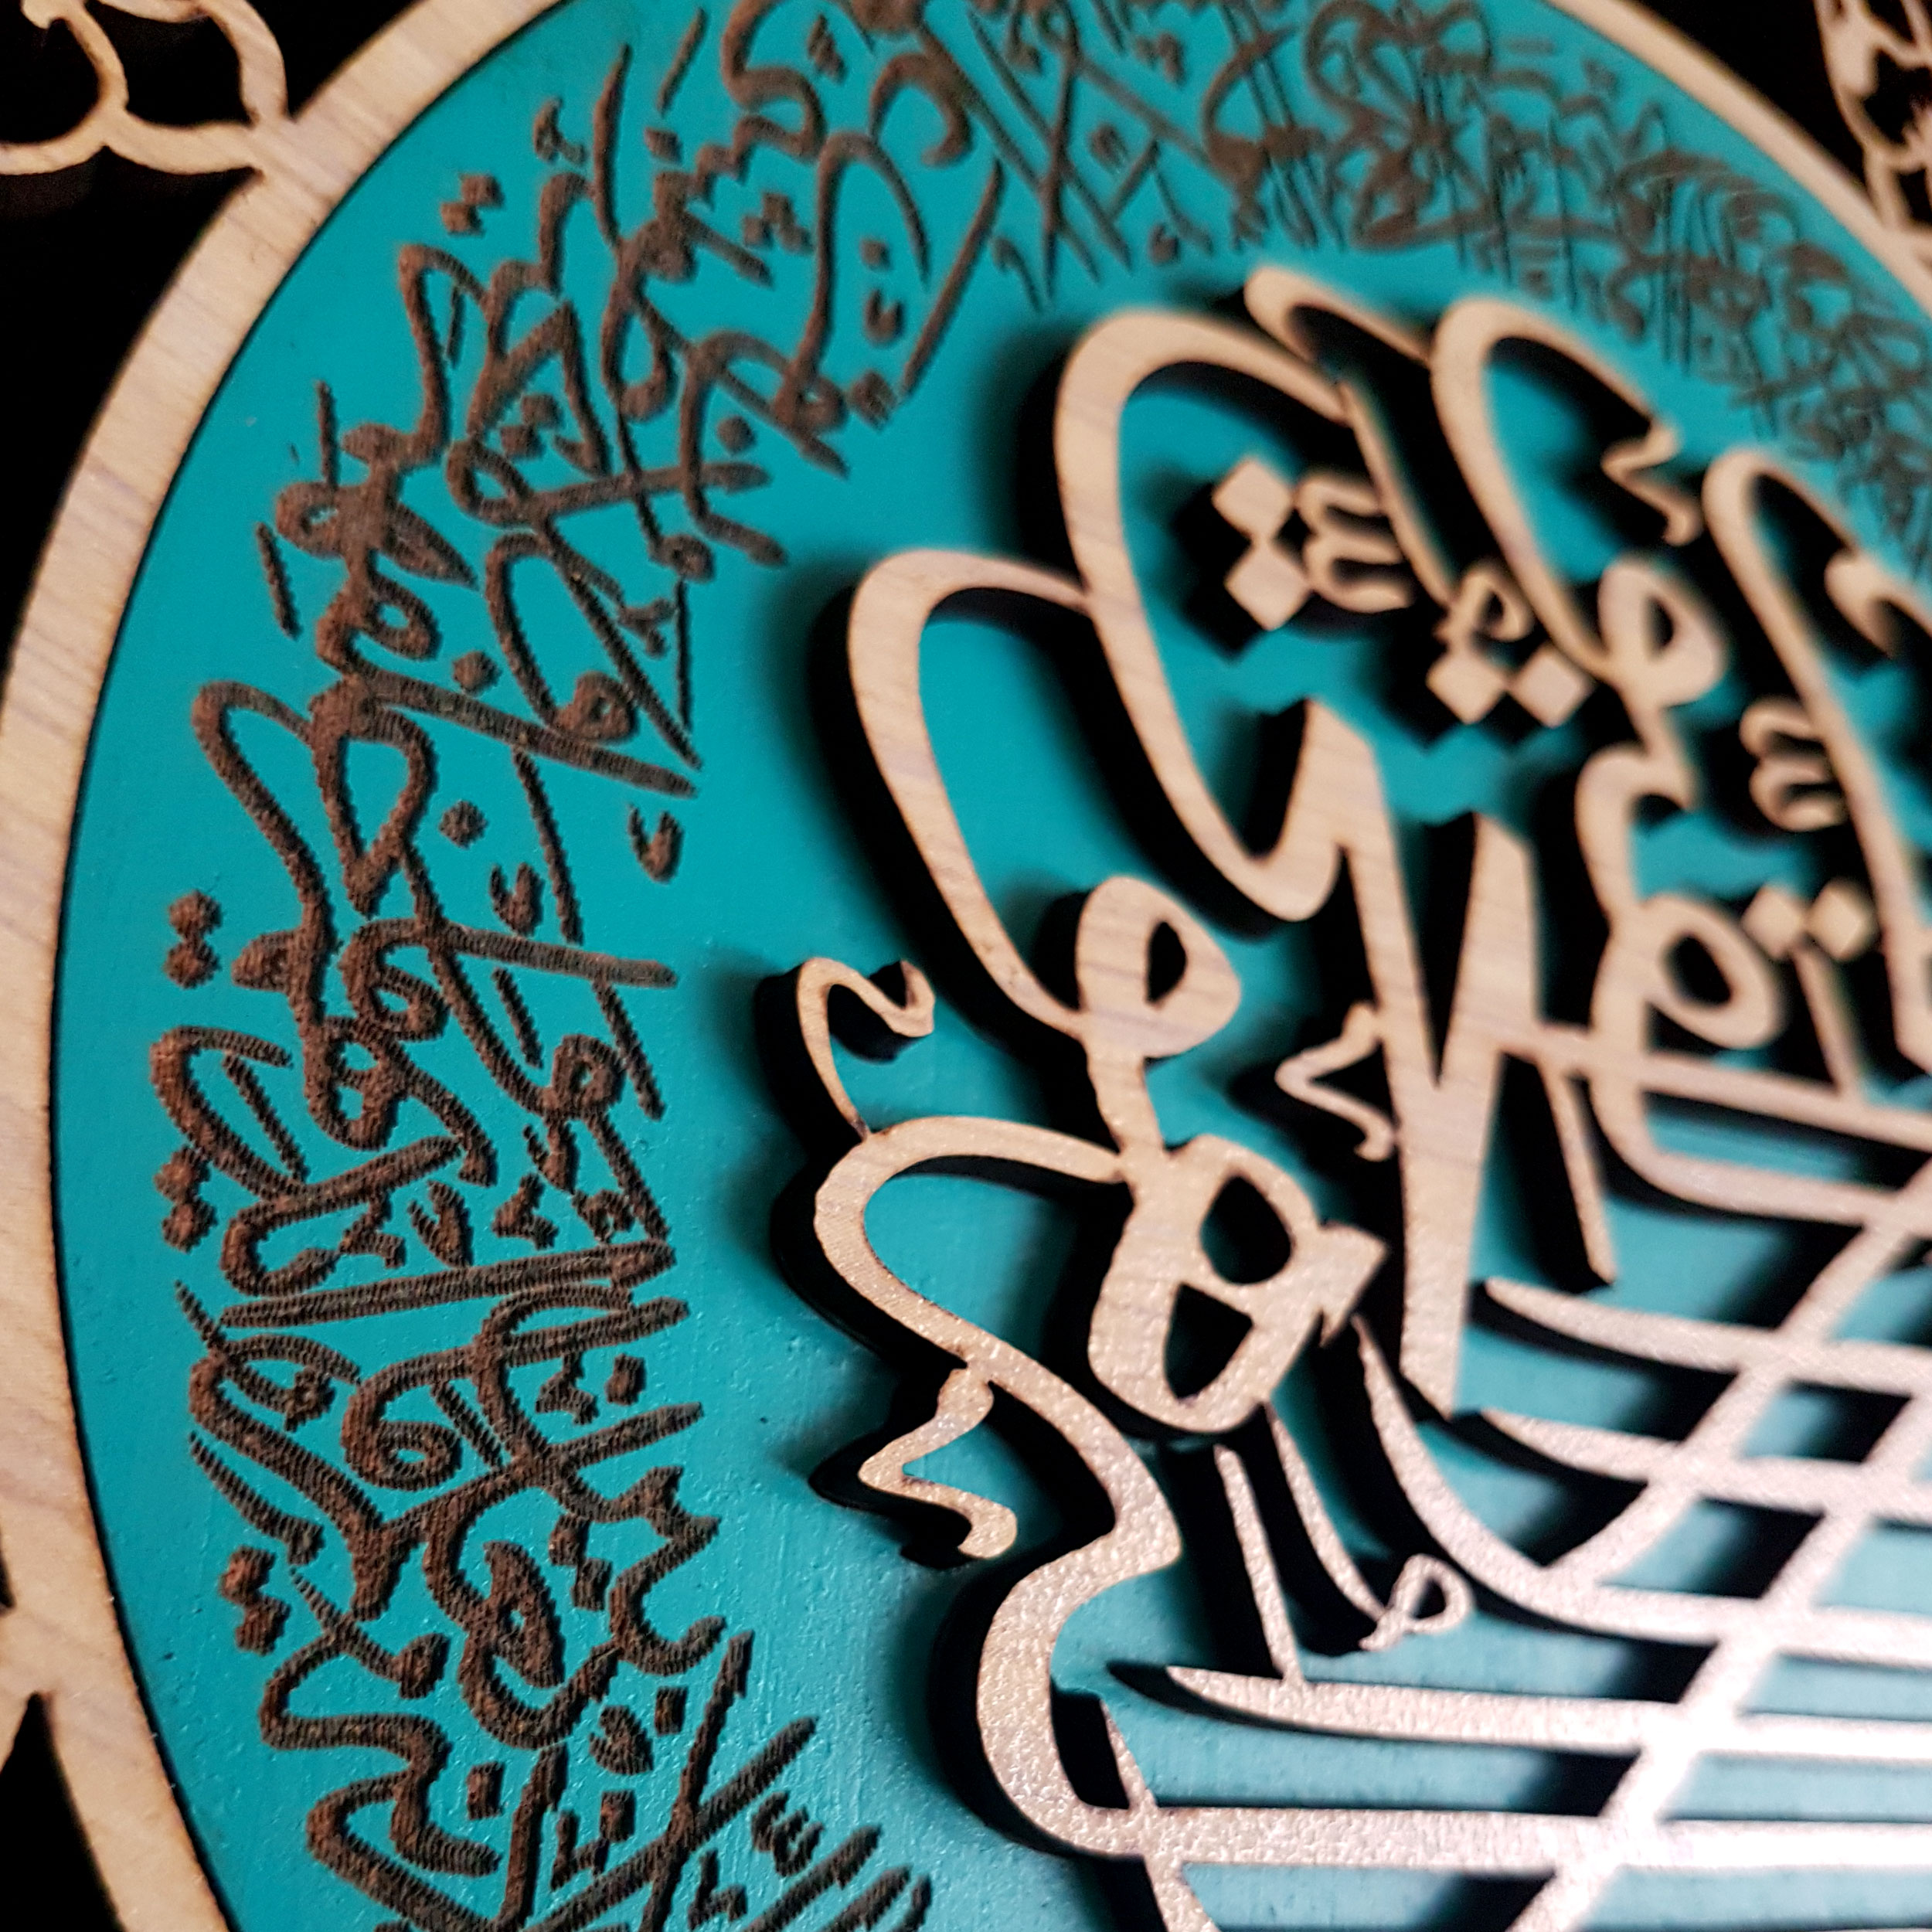 خرید                      تابلو معرق کاری طرح خوشنویسی سوره آیت الکرسی کد G696-9